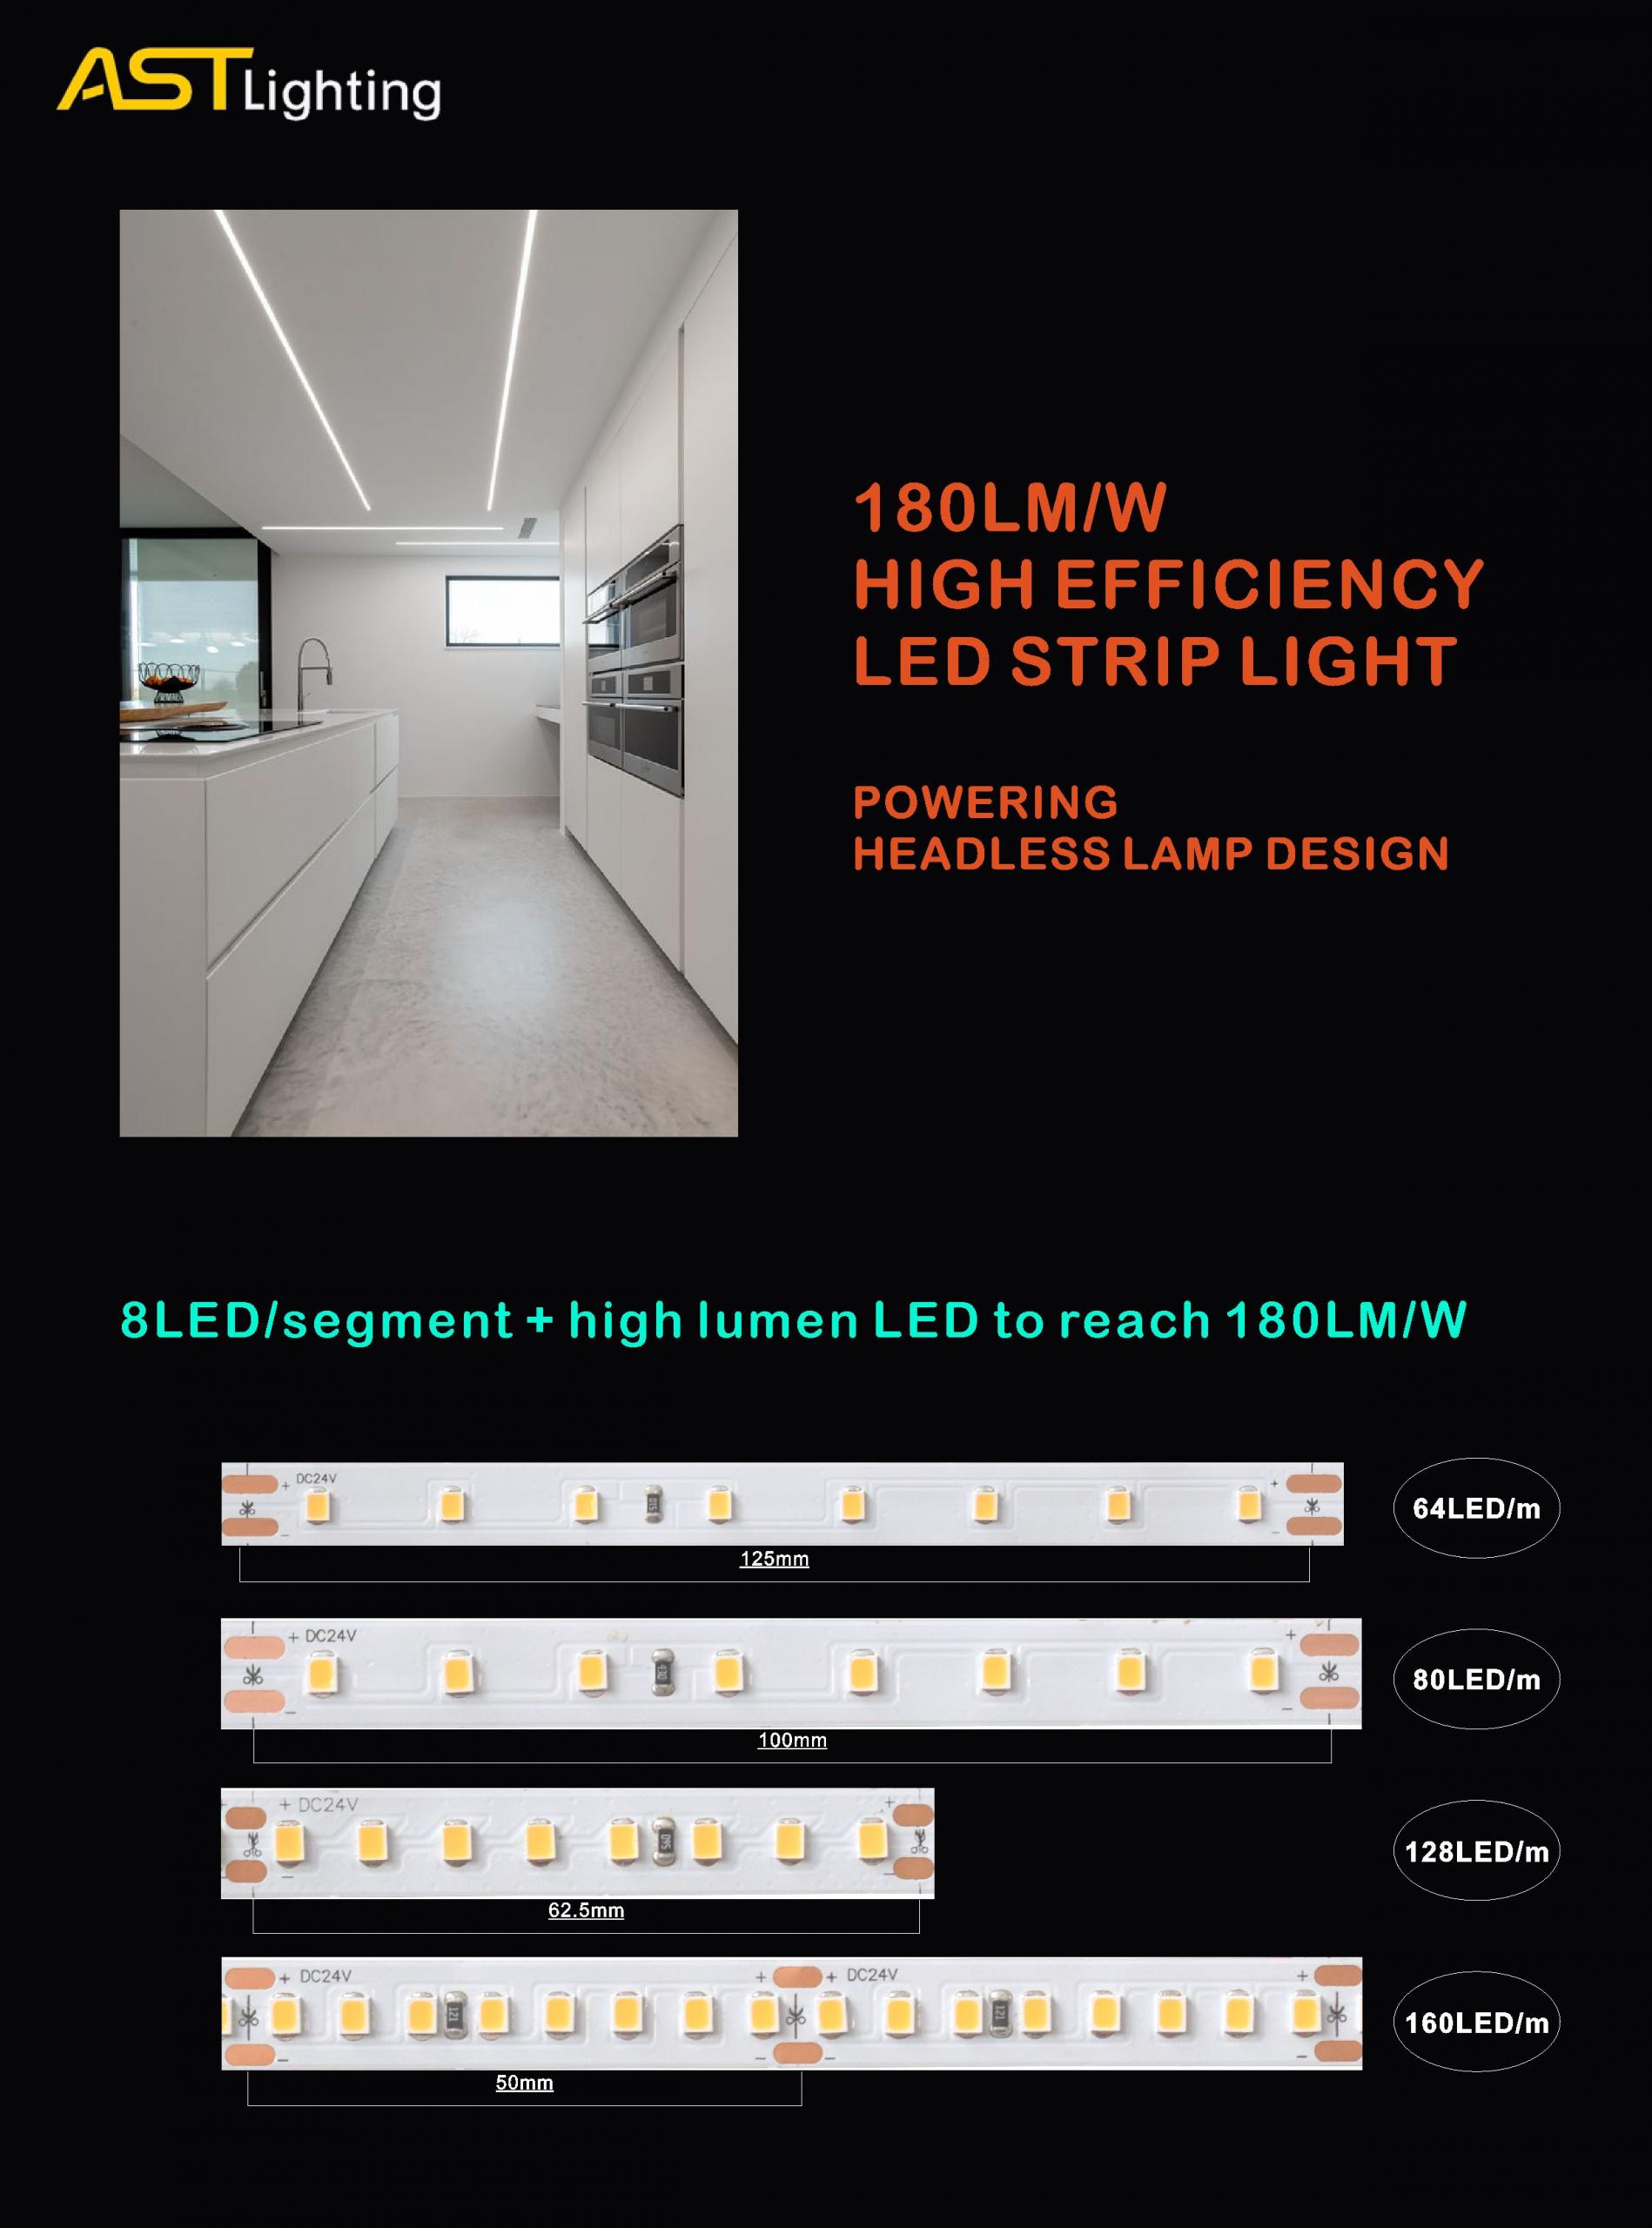 High efficiency 180LM W LED Strip Light